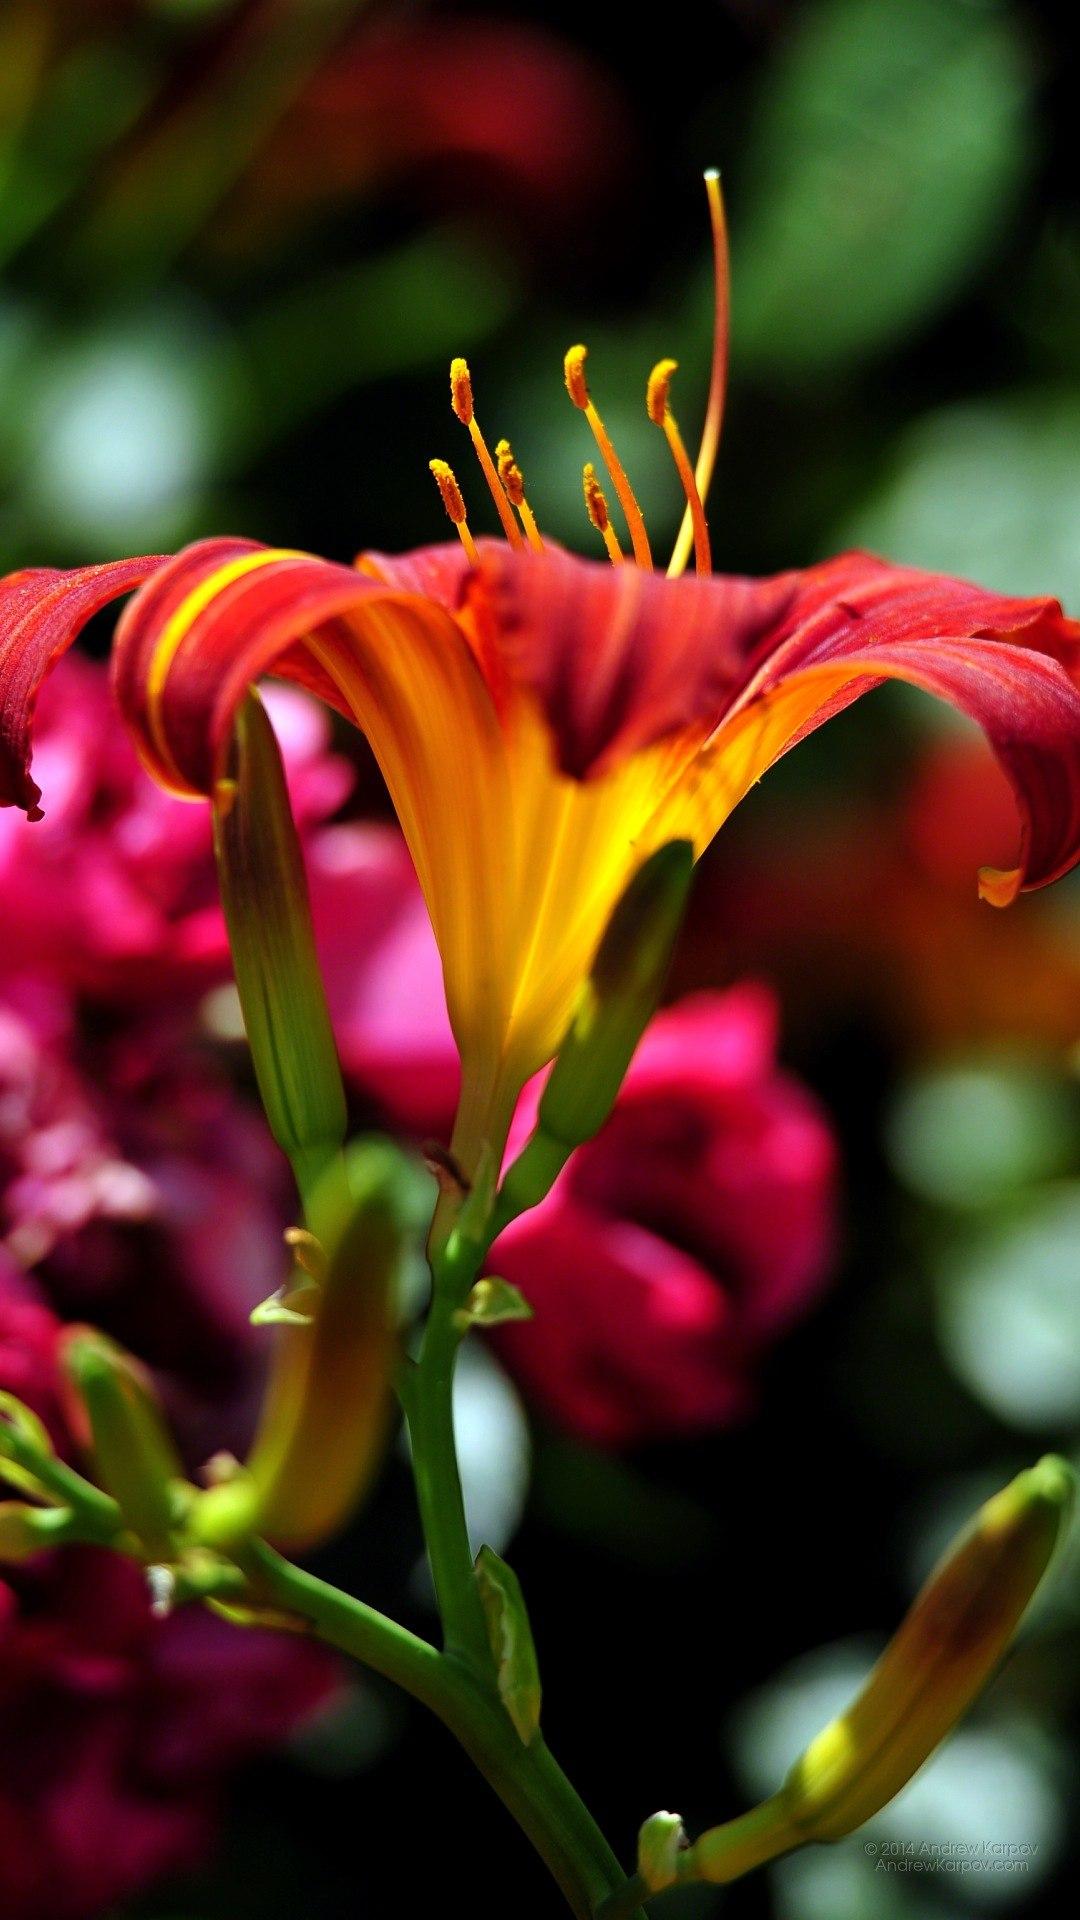 Фото цветов для смартфона